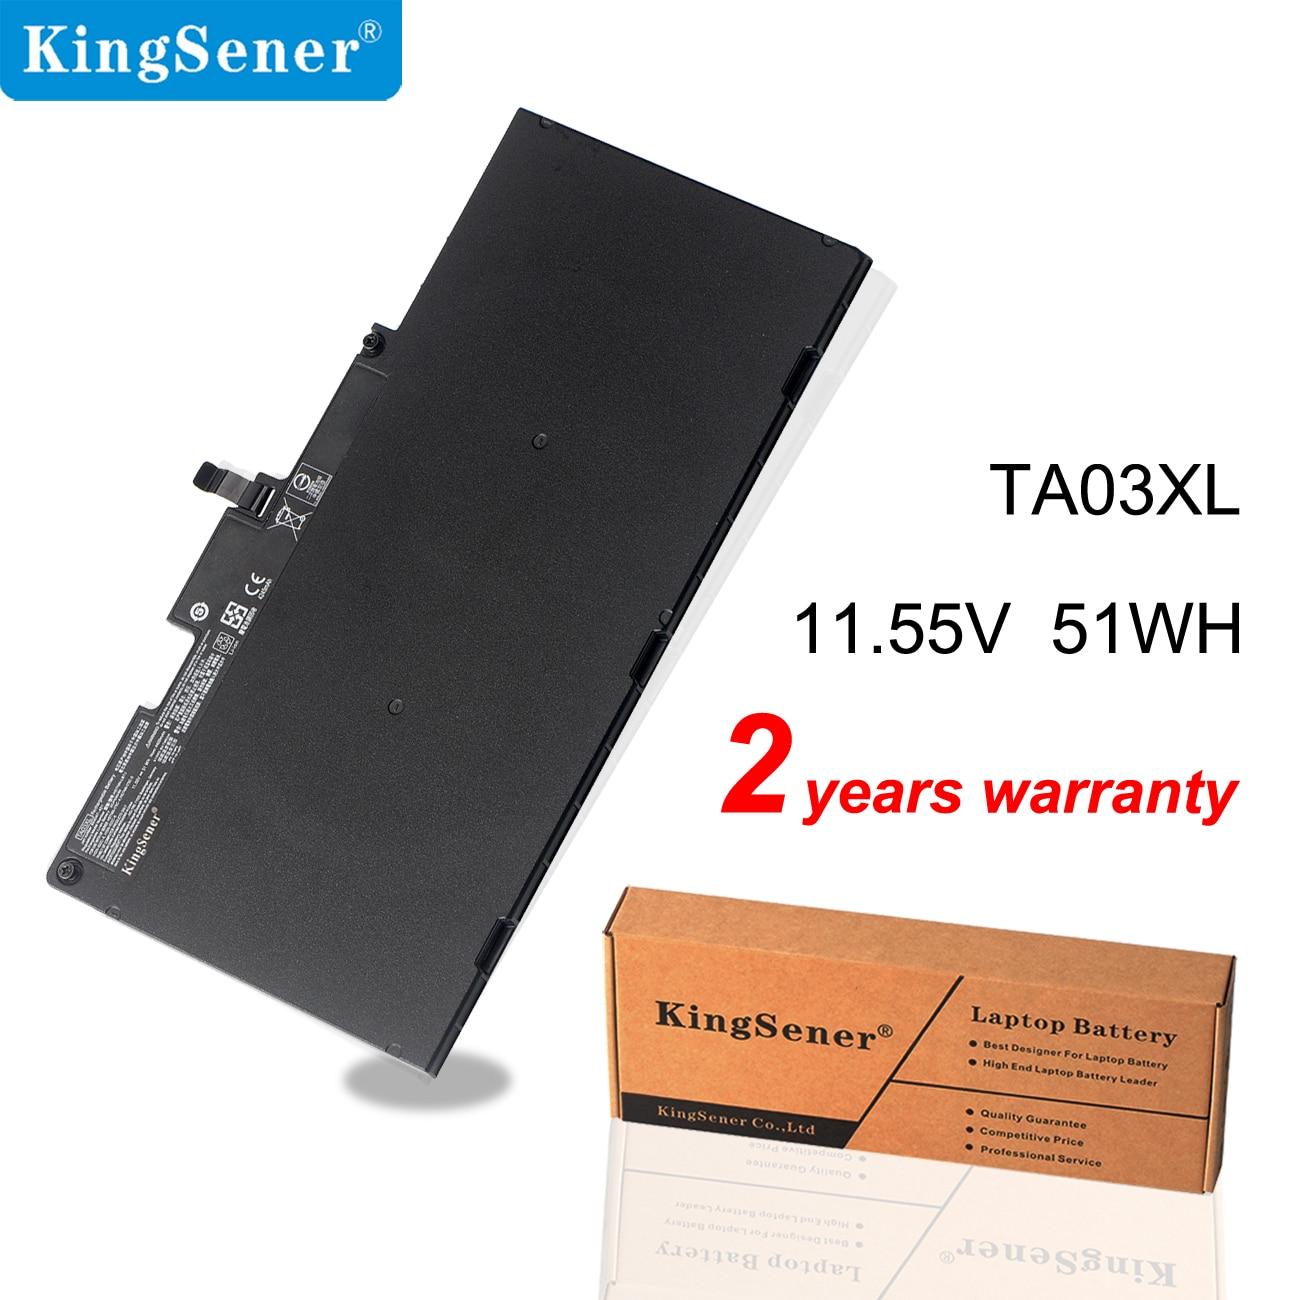 KingSener TA03XL Laptop Battery For HP EliteBook 755 G4 840 G4 848 G4 850 Series HSTNN-IB7L HSTNN-LB7J 854047-421 11.55V 51WH kingsener cm03xl battery for hp elitebook 840 845 850 740 745 750 g1 g2 series hstnn db4q hstnn ib4r lb4r e7u24aa 716724 171